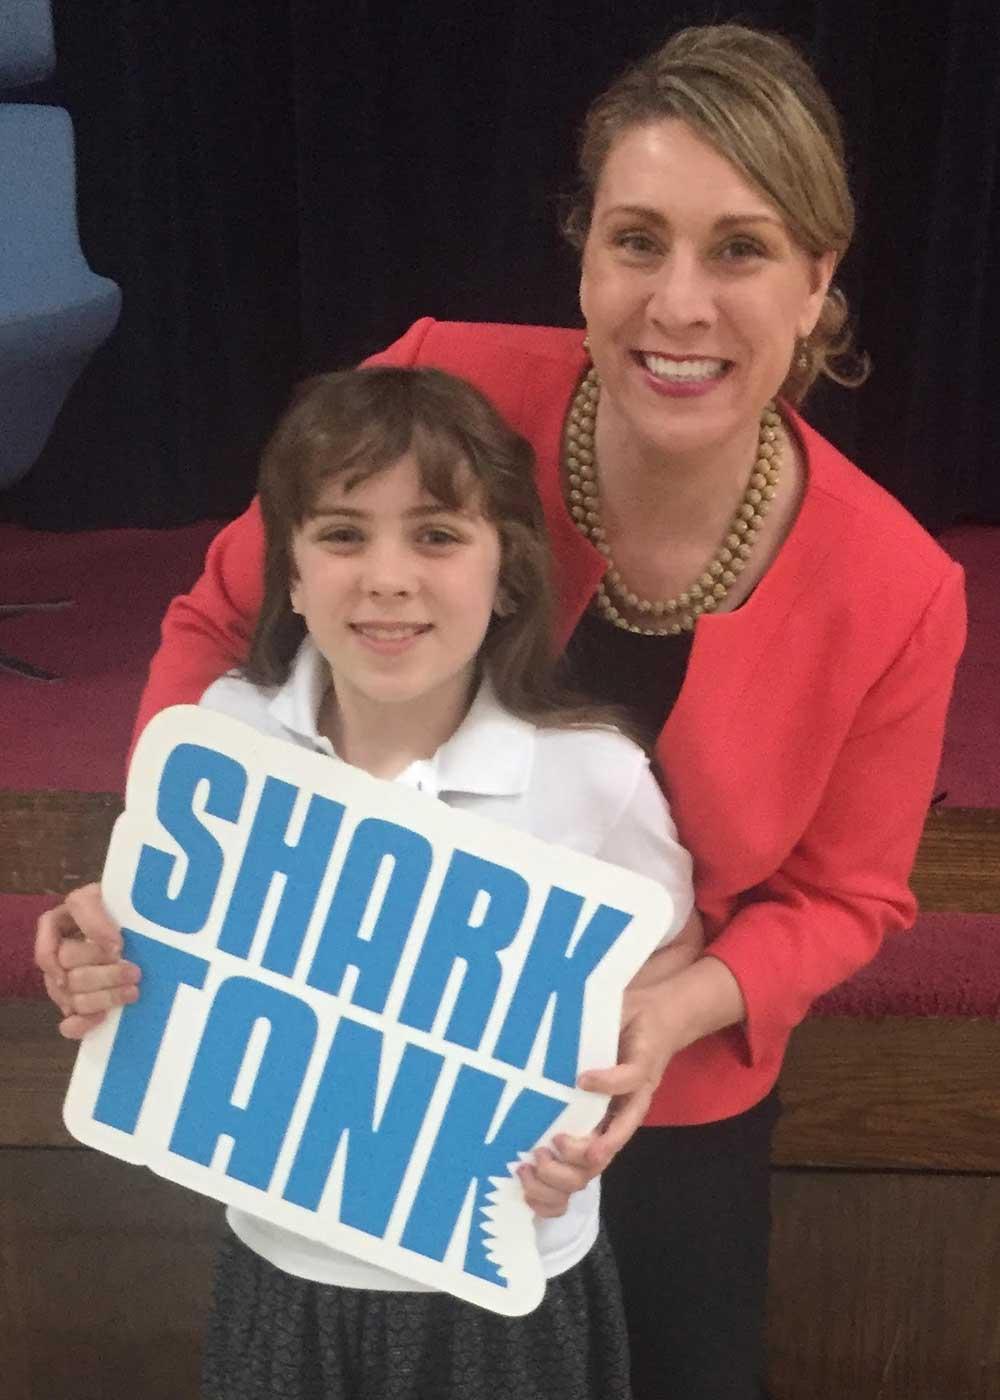 Bridget Verdun and her daughter on the set of Shark Tank